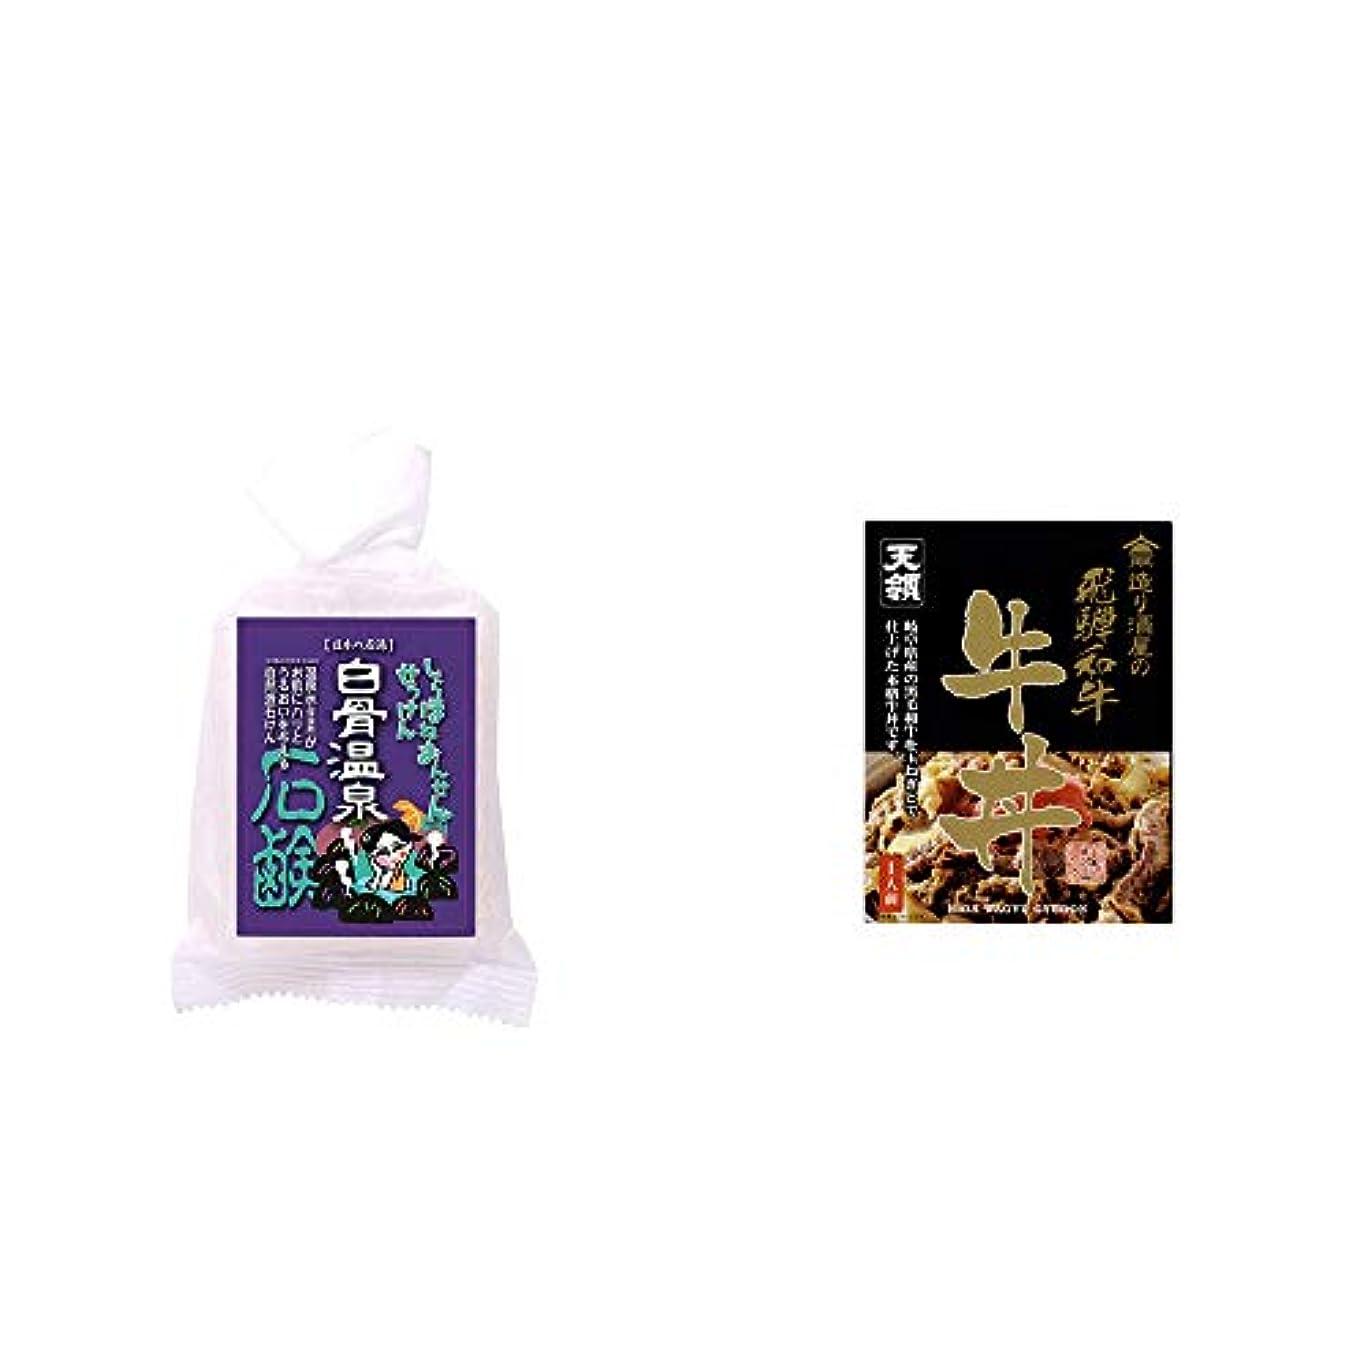 怠感味散髪[2点セット] 信州 白骨温泉石鹸(80g)?天領酒造 造り酒屋の飛騨和牛 牛丼(1人前)